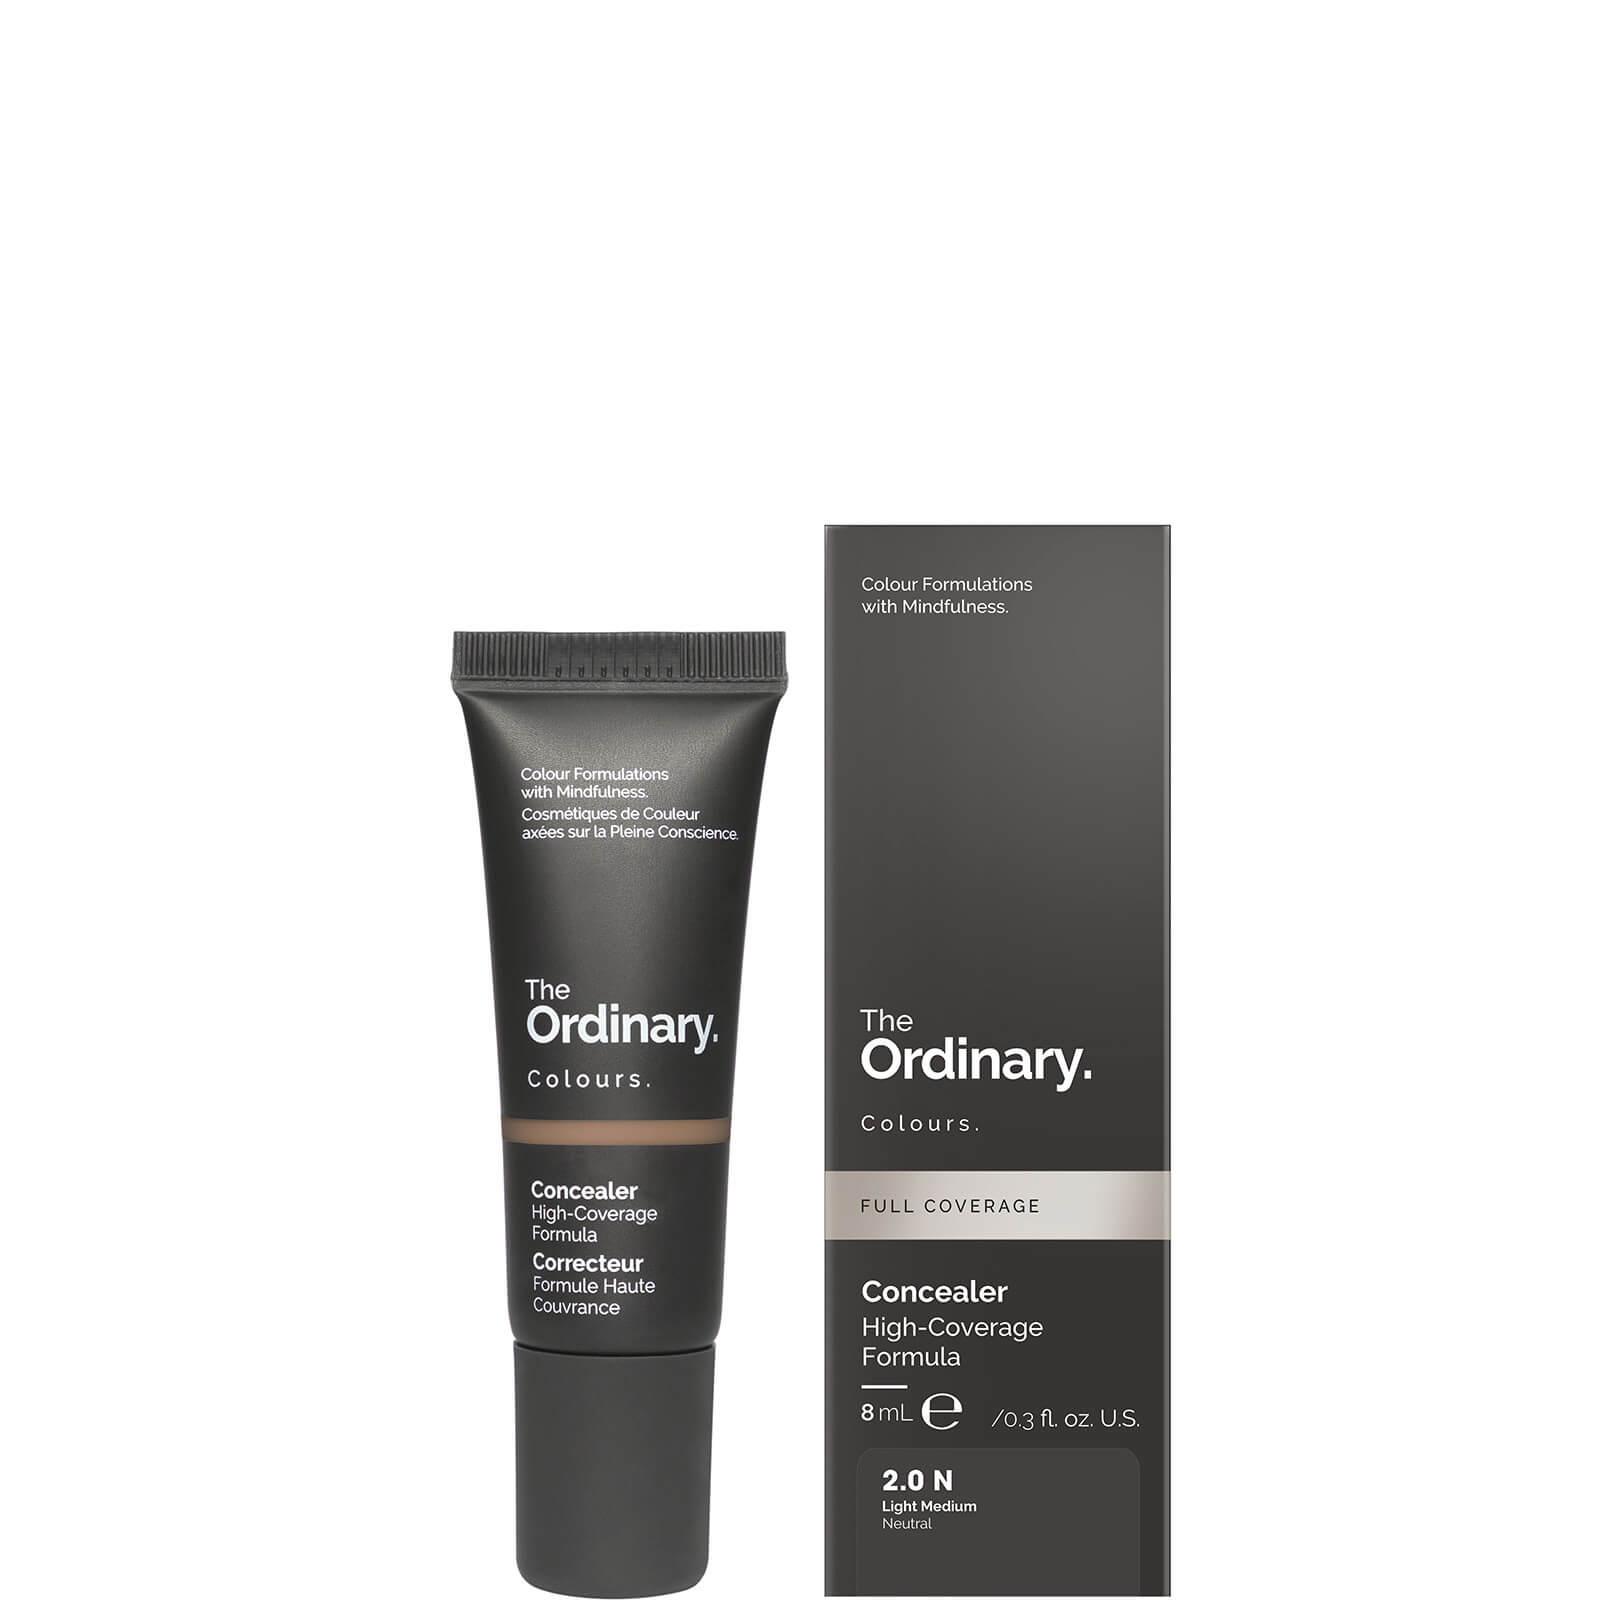 Купить The Ordinary Concealer - 2.0 N 8ml